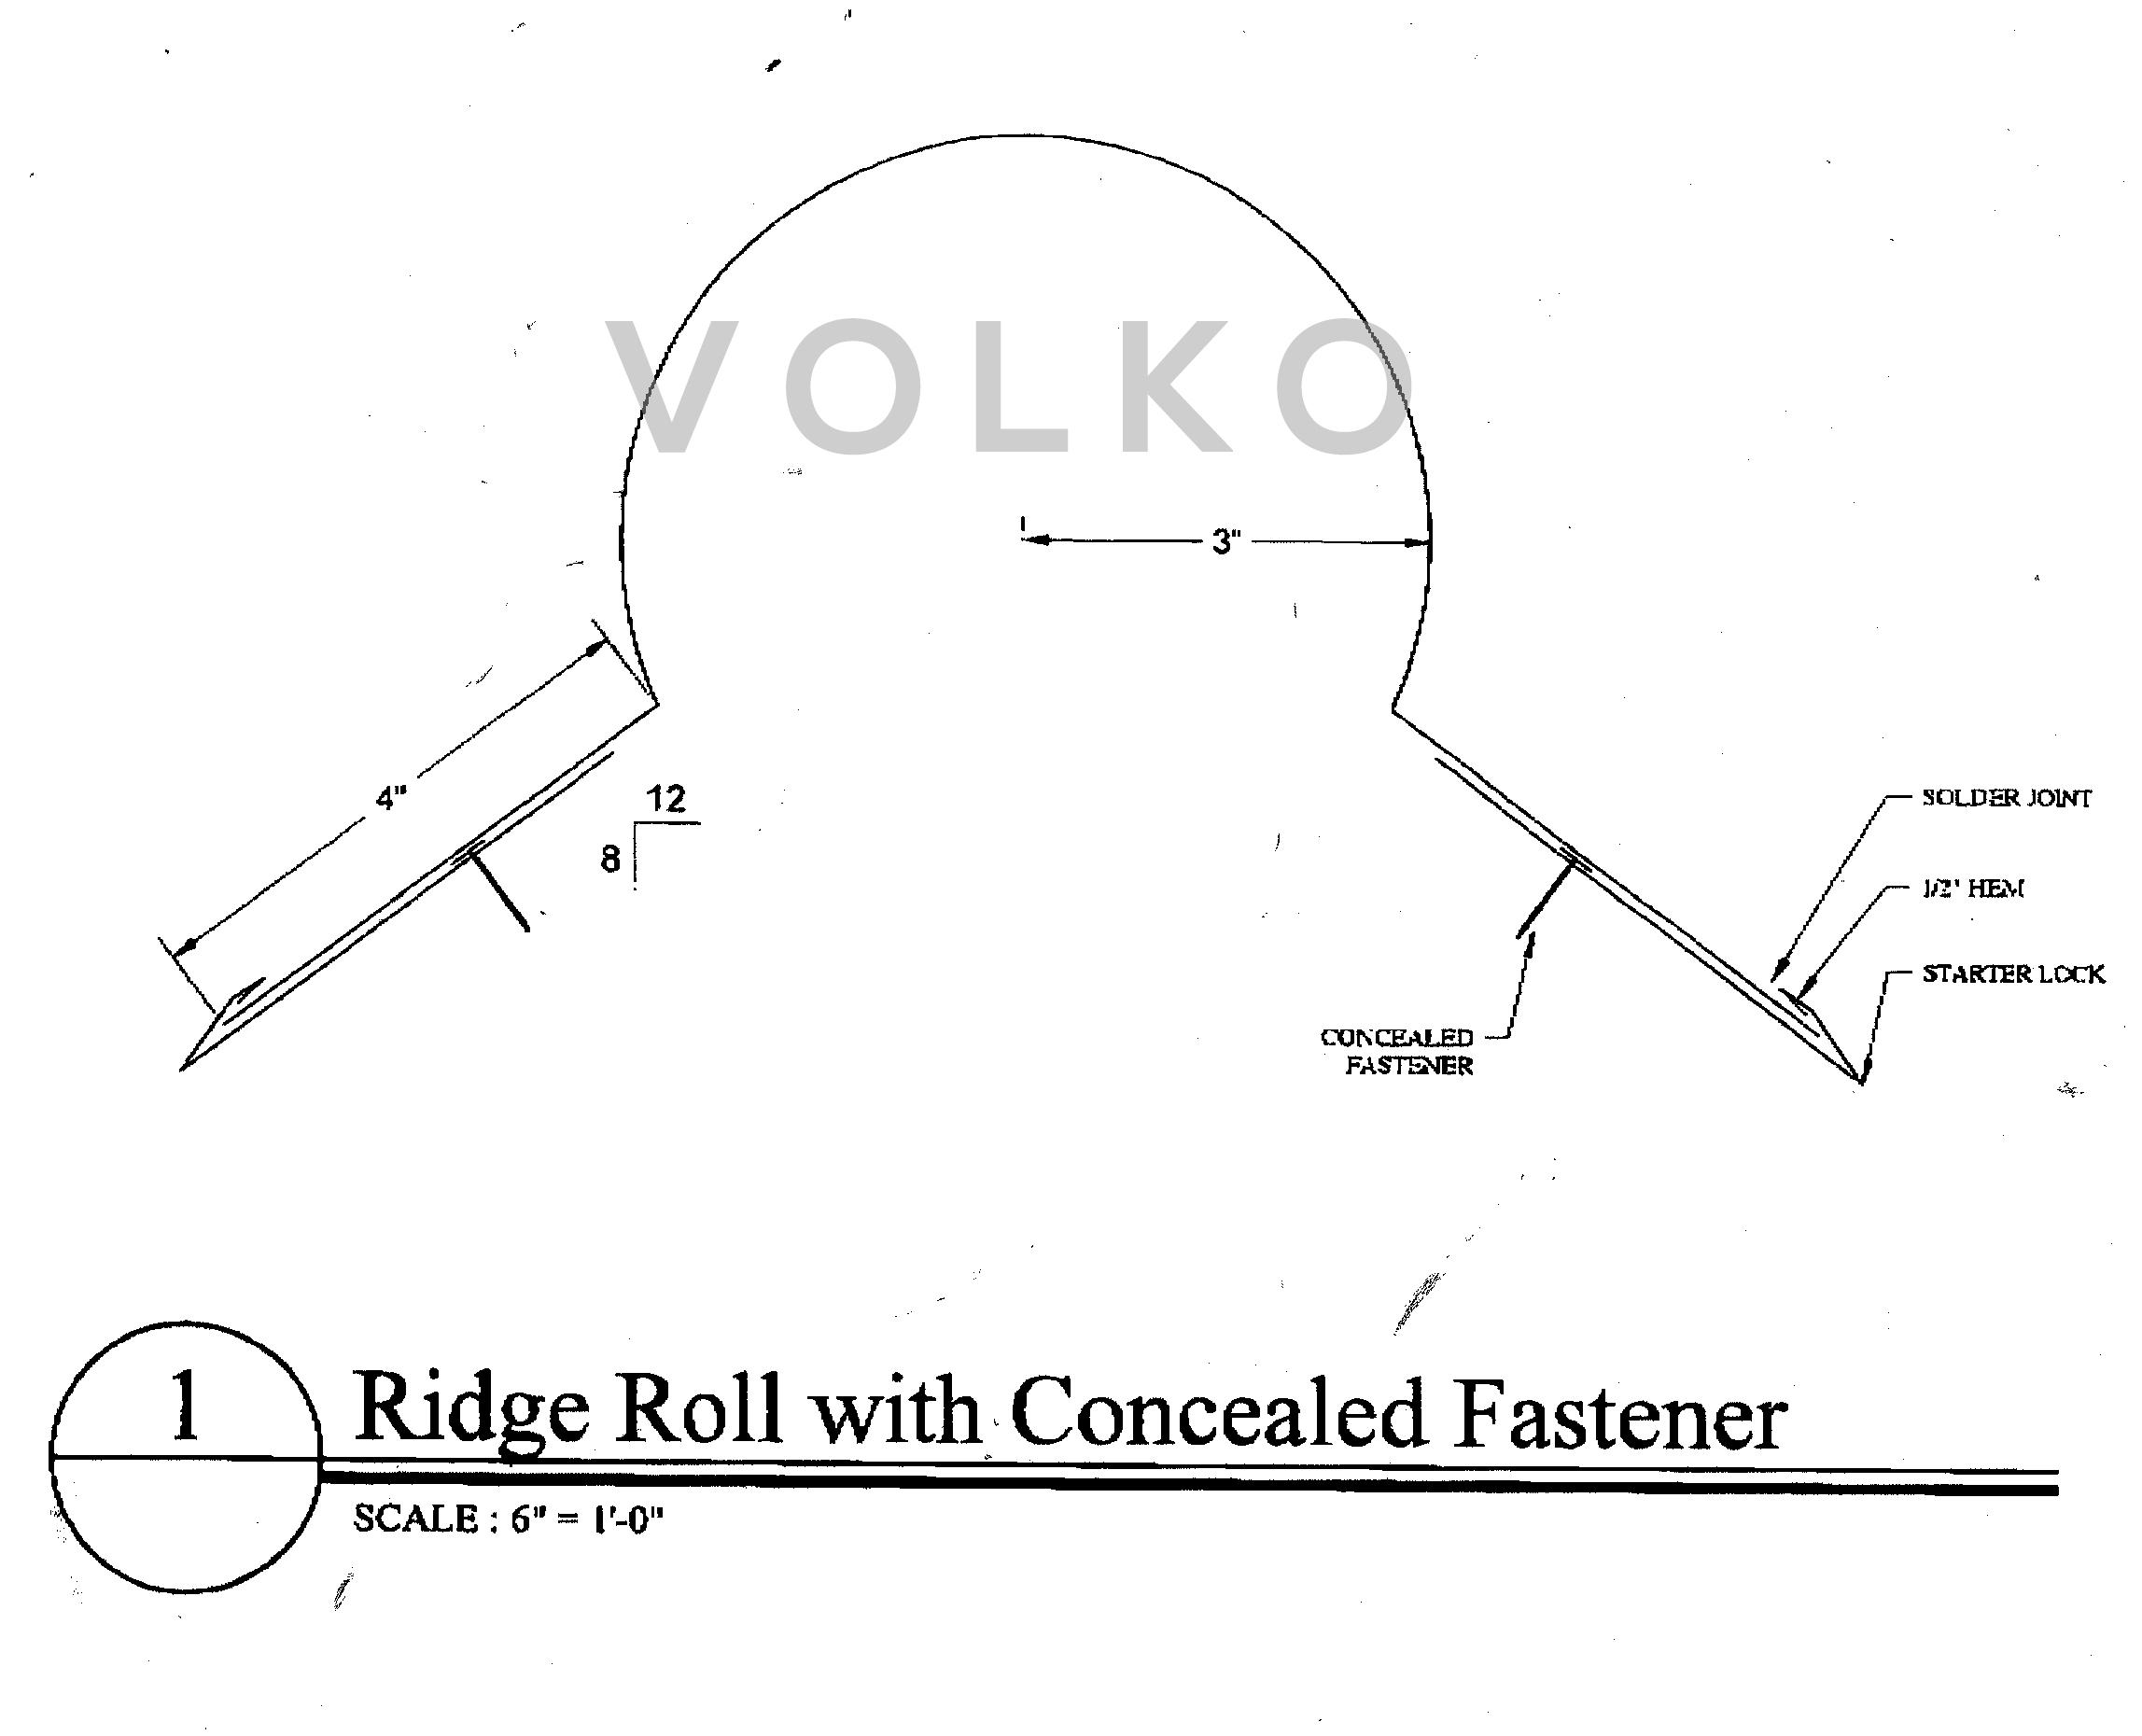 copper ridge roll drawing